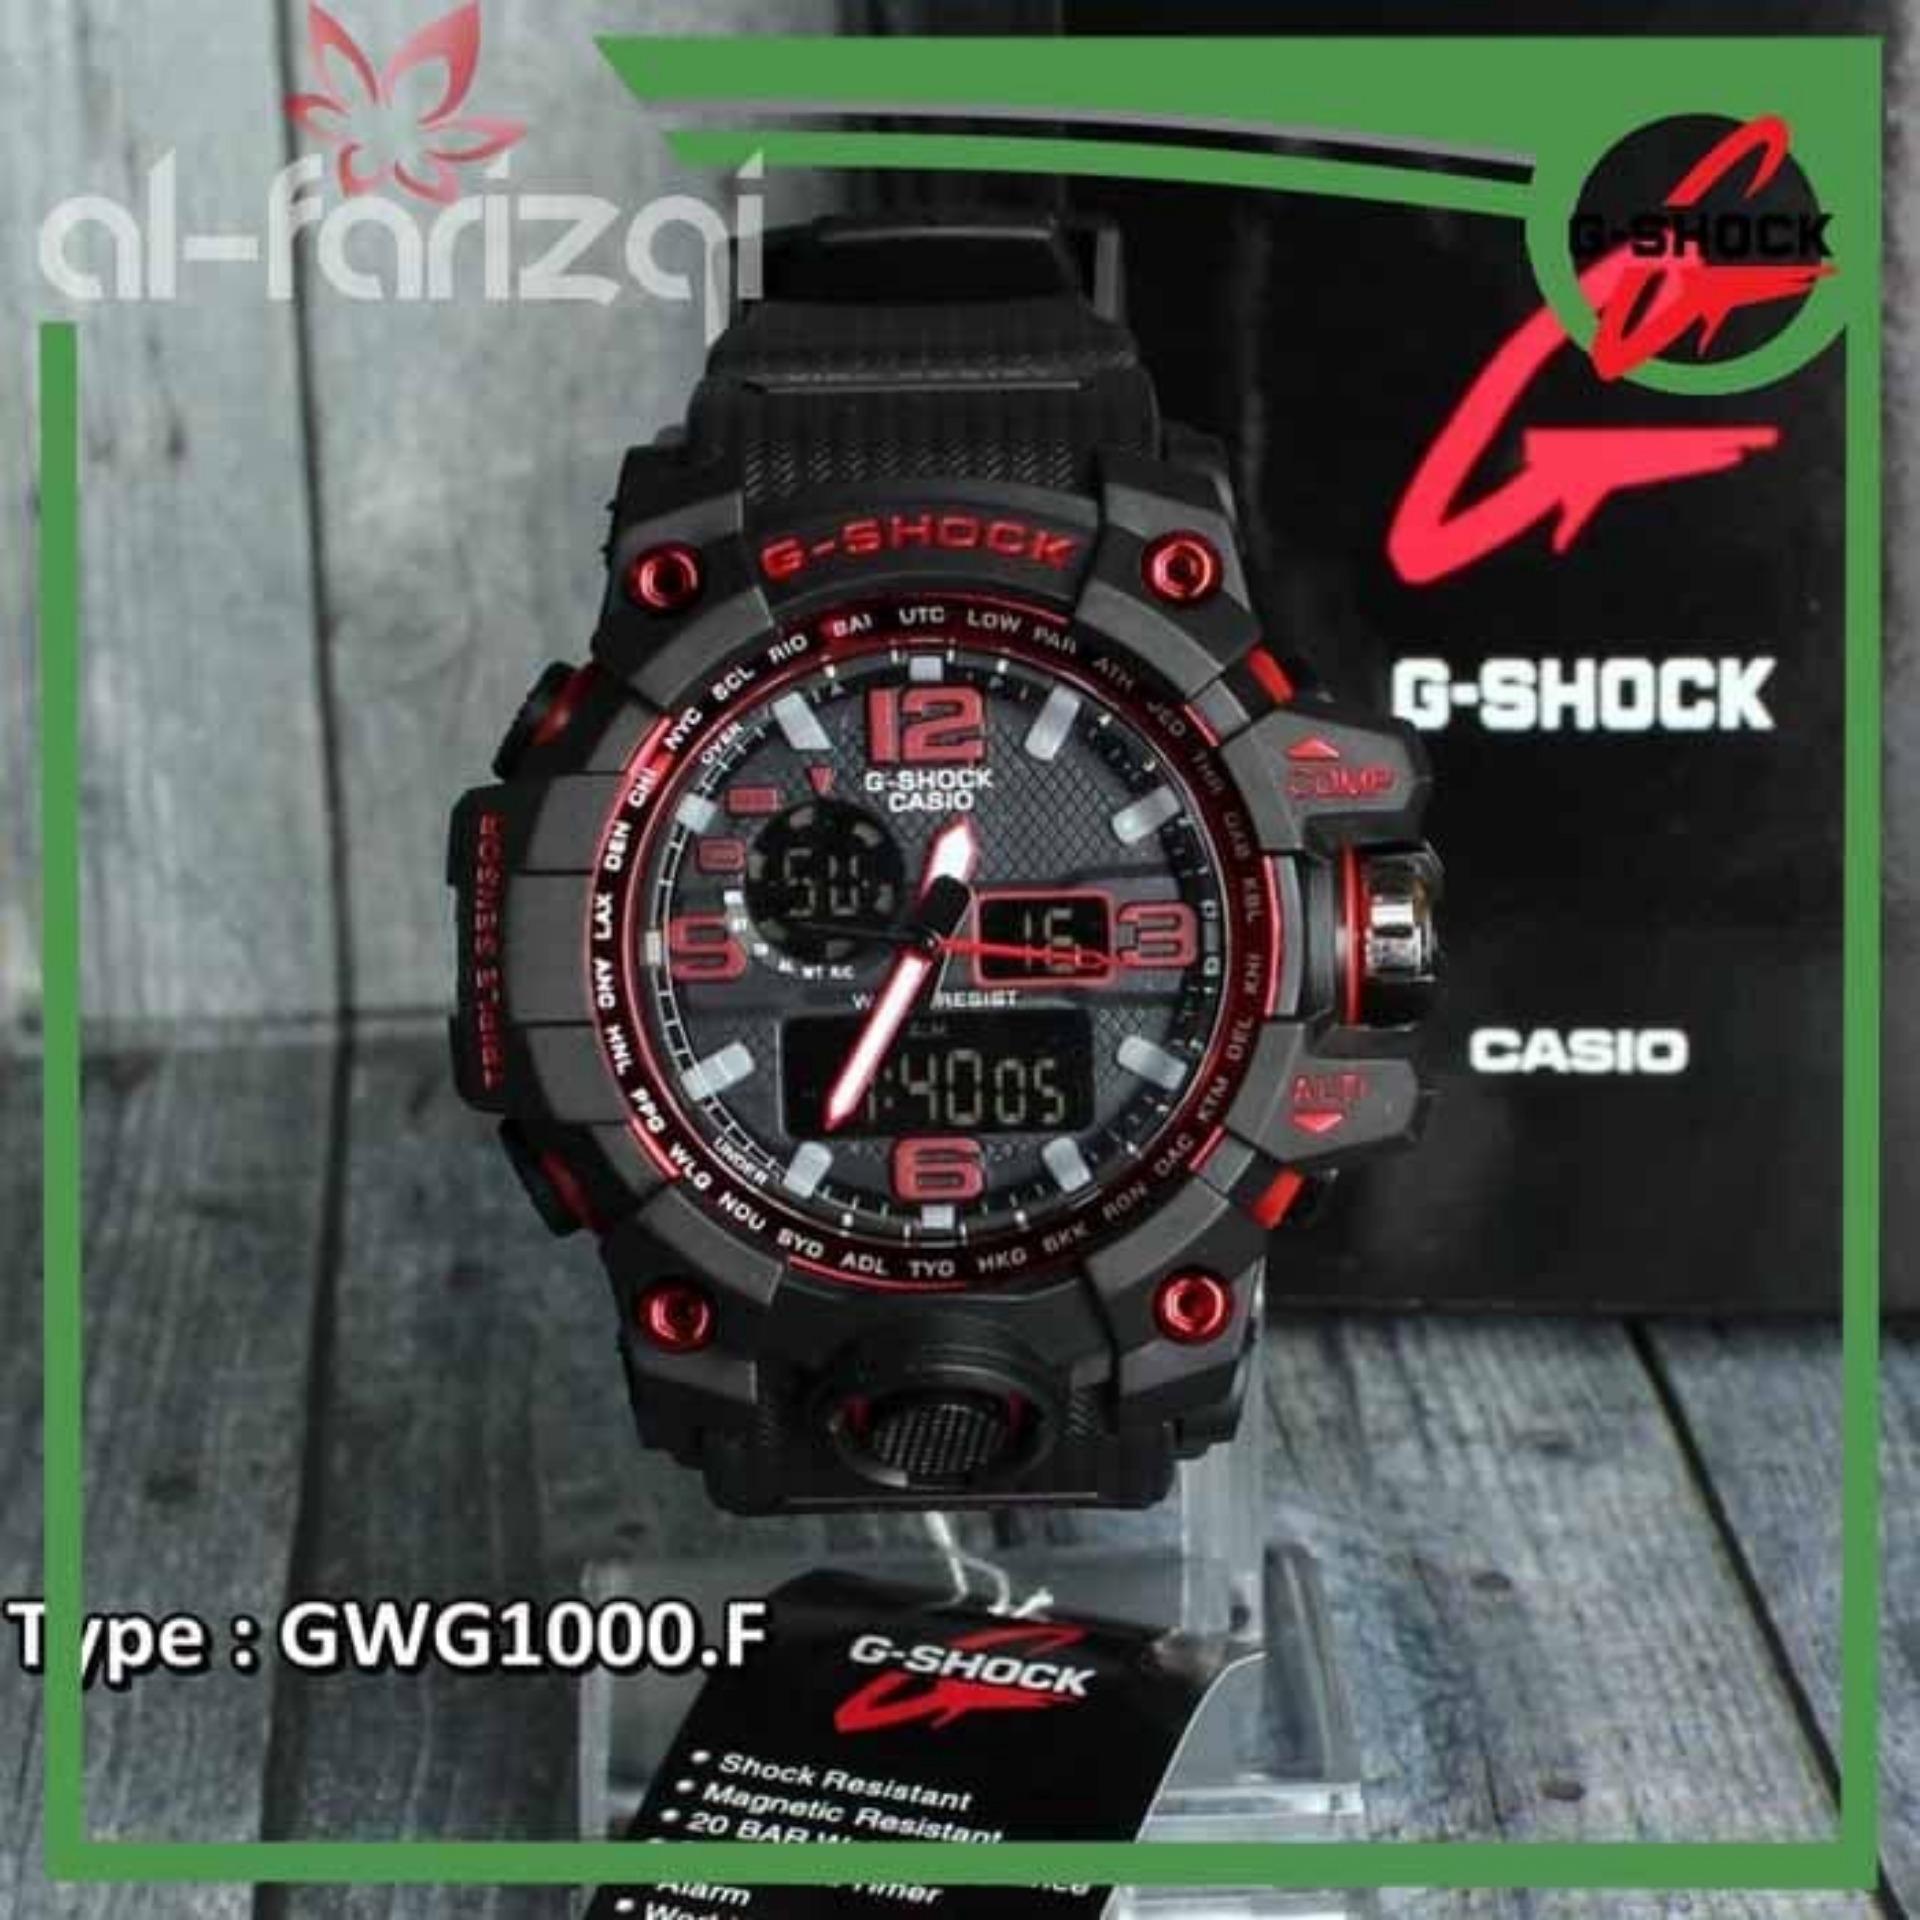 Jam Tangan Pria Dual Time Casio Gshock Gwg1000 Black Hitam Skmei Eiger